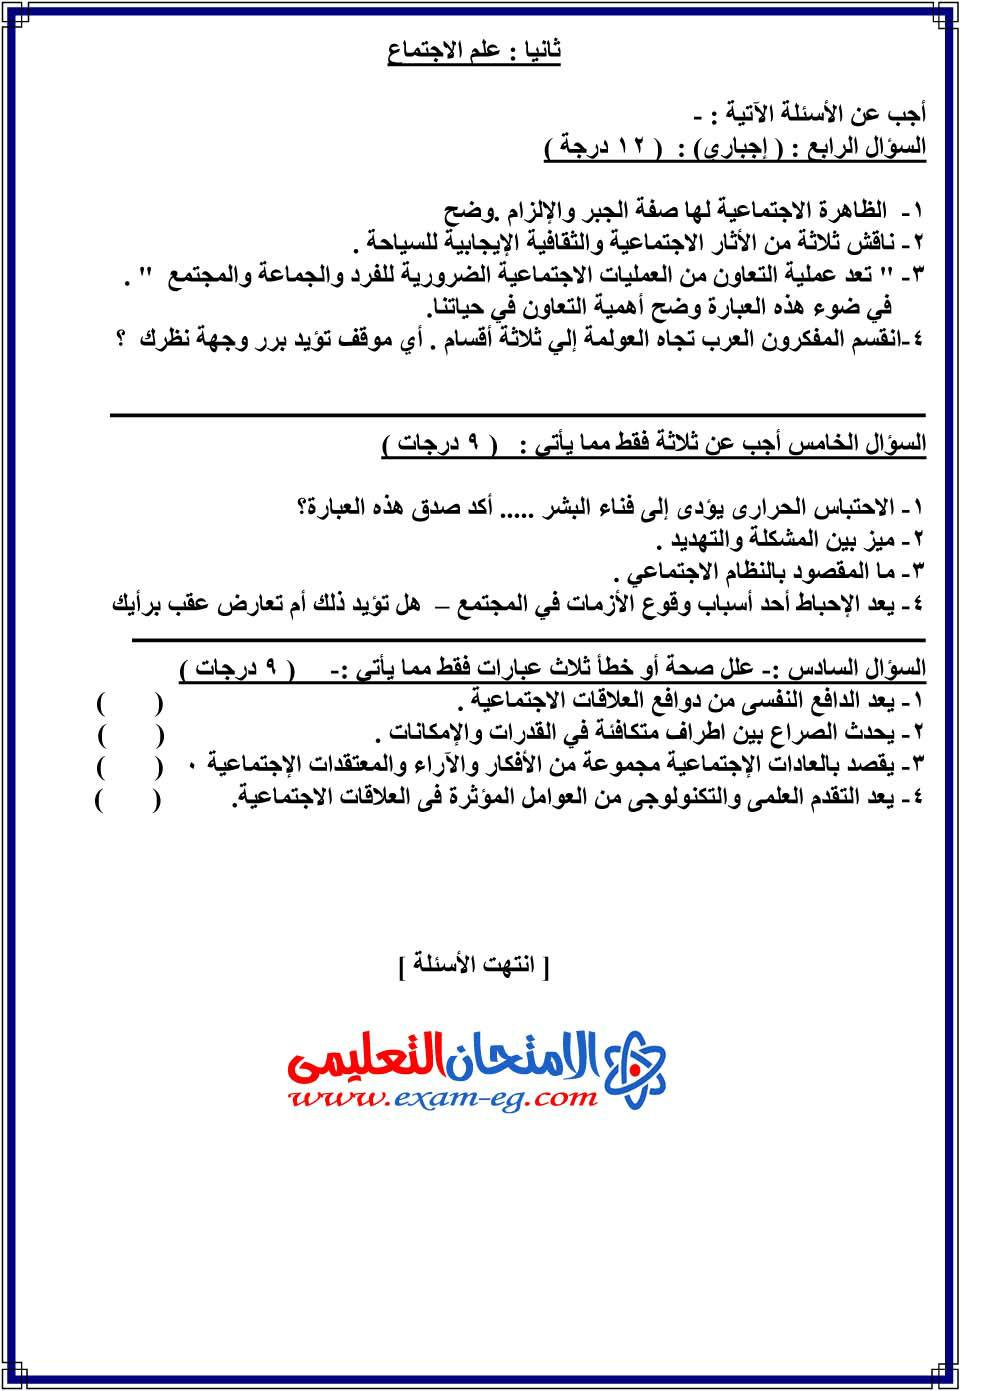 exam-eg.com_1396624098882.jpg